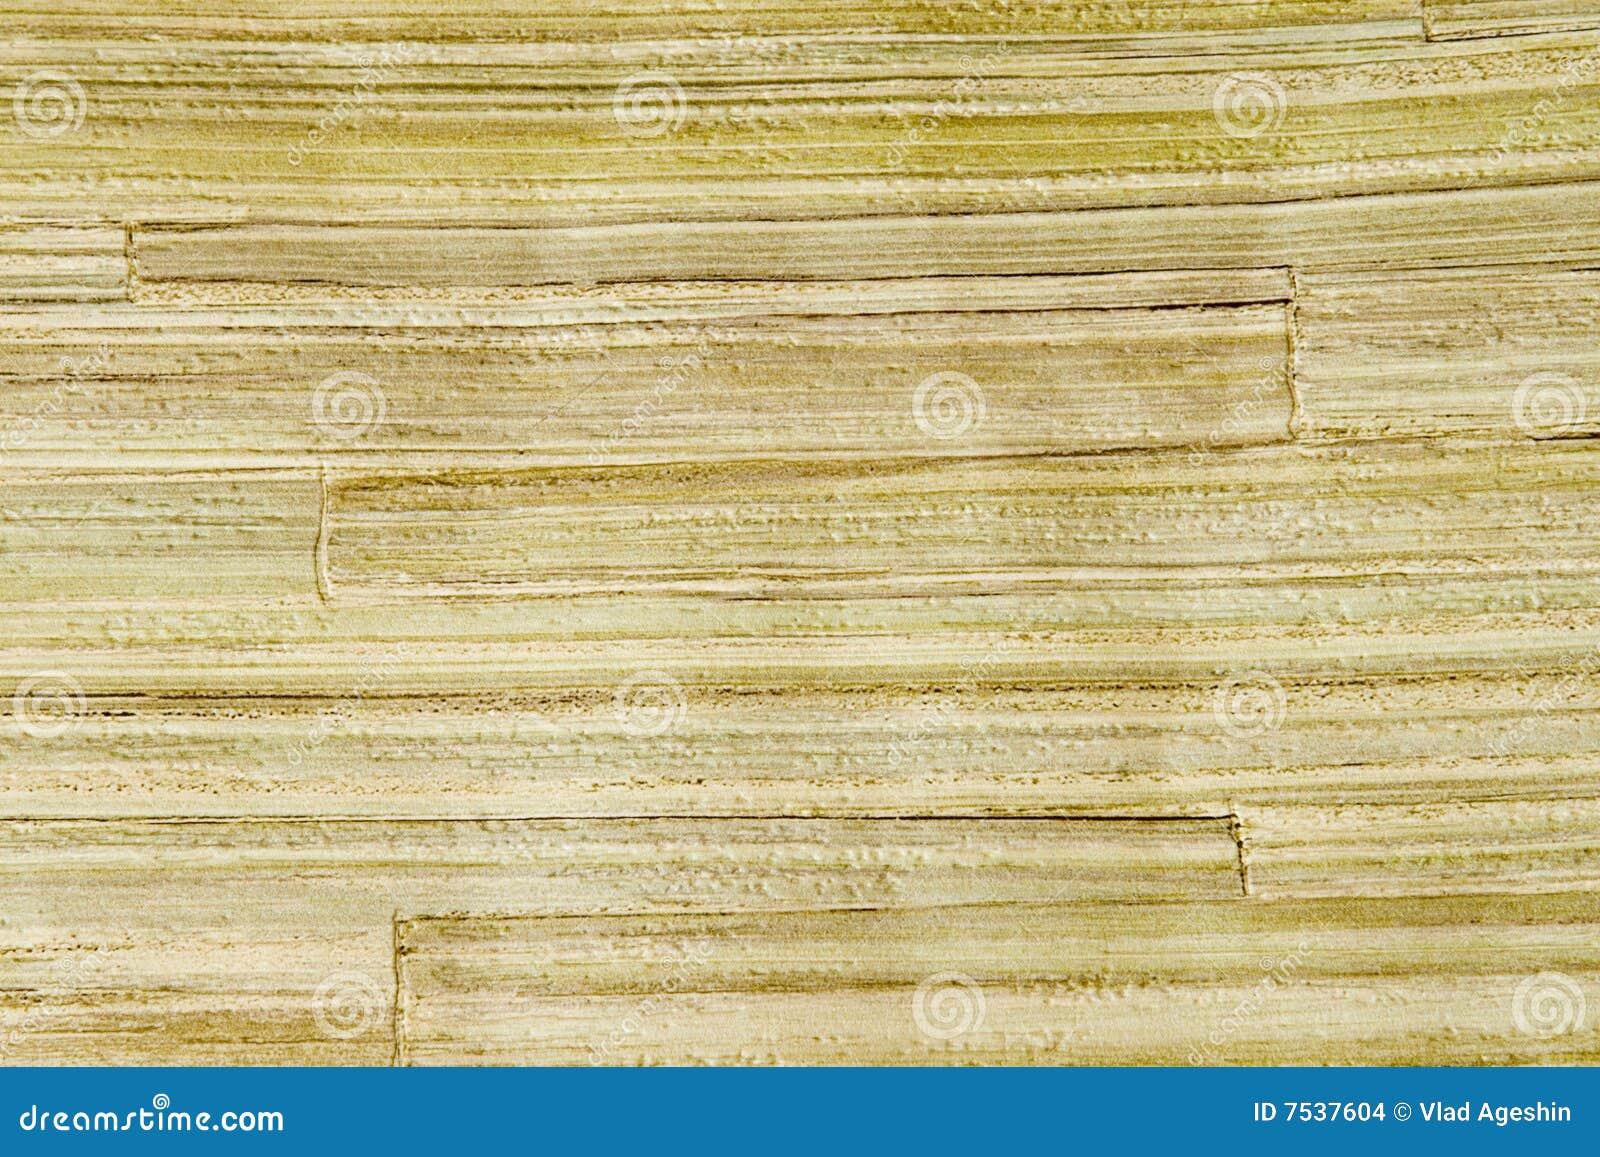 Carta da parati di bamb decorativa fotografia stock immagine di naughty blank 7537604 - Carta da parati decorativa ...